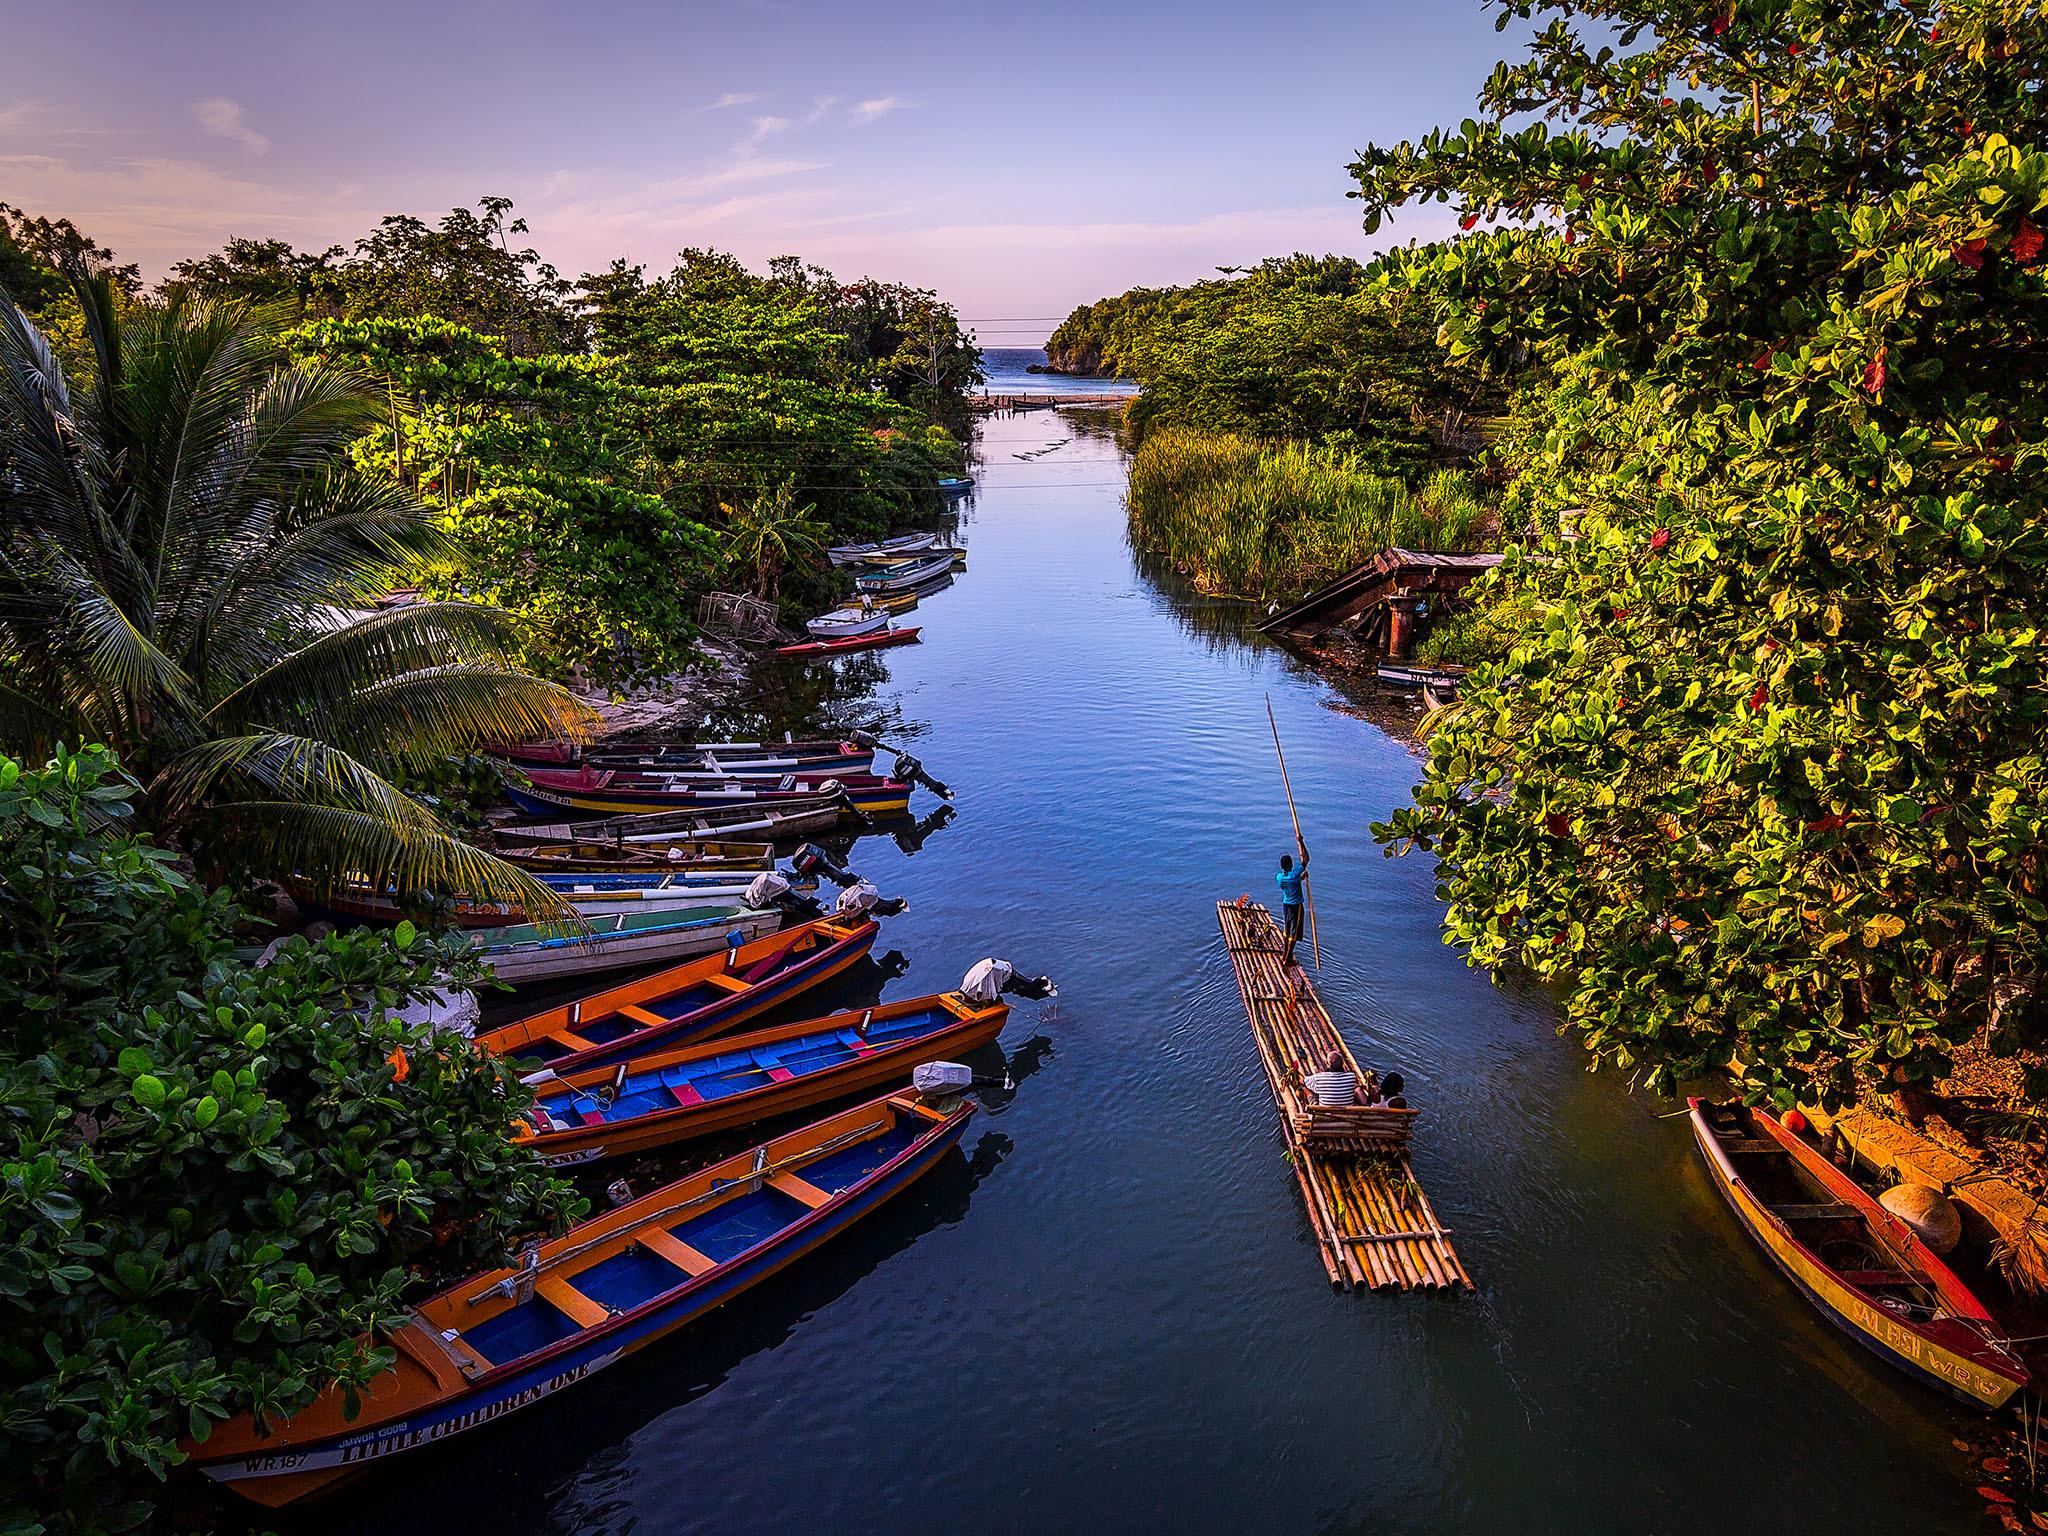 Jamaica is welcoming international tourists